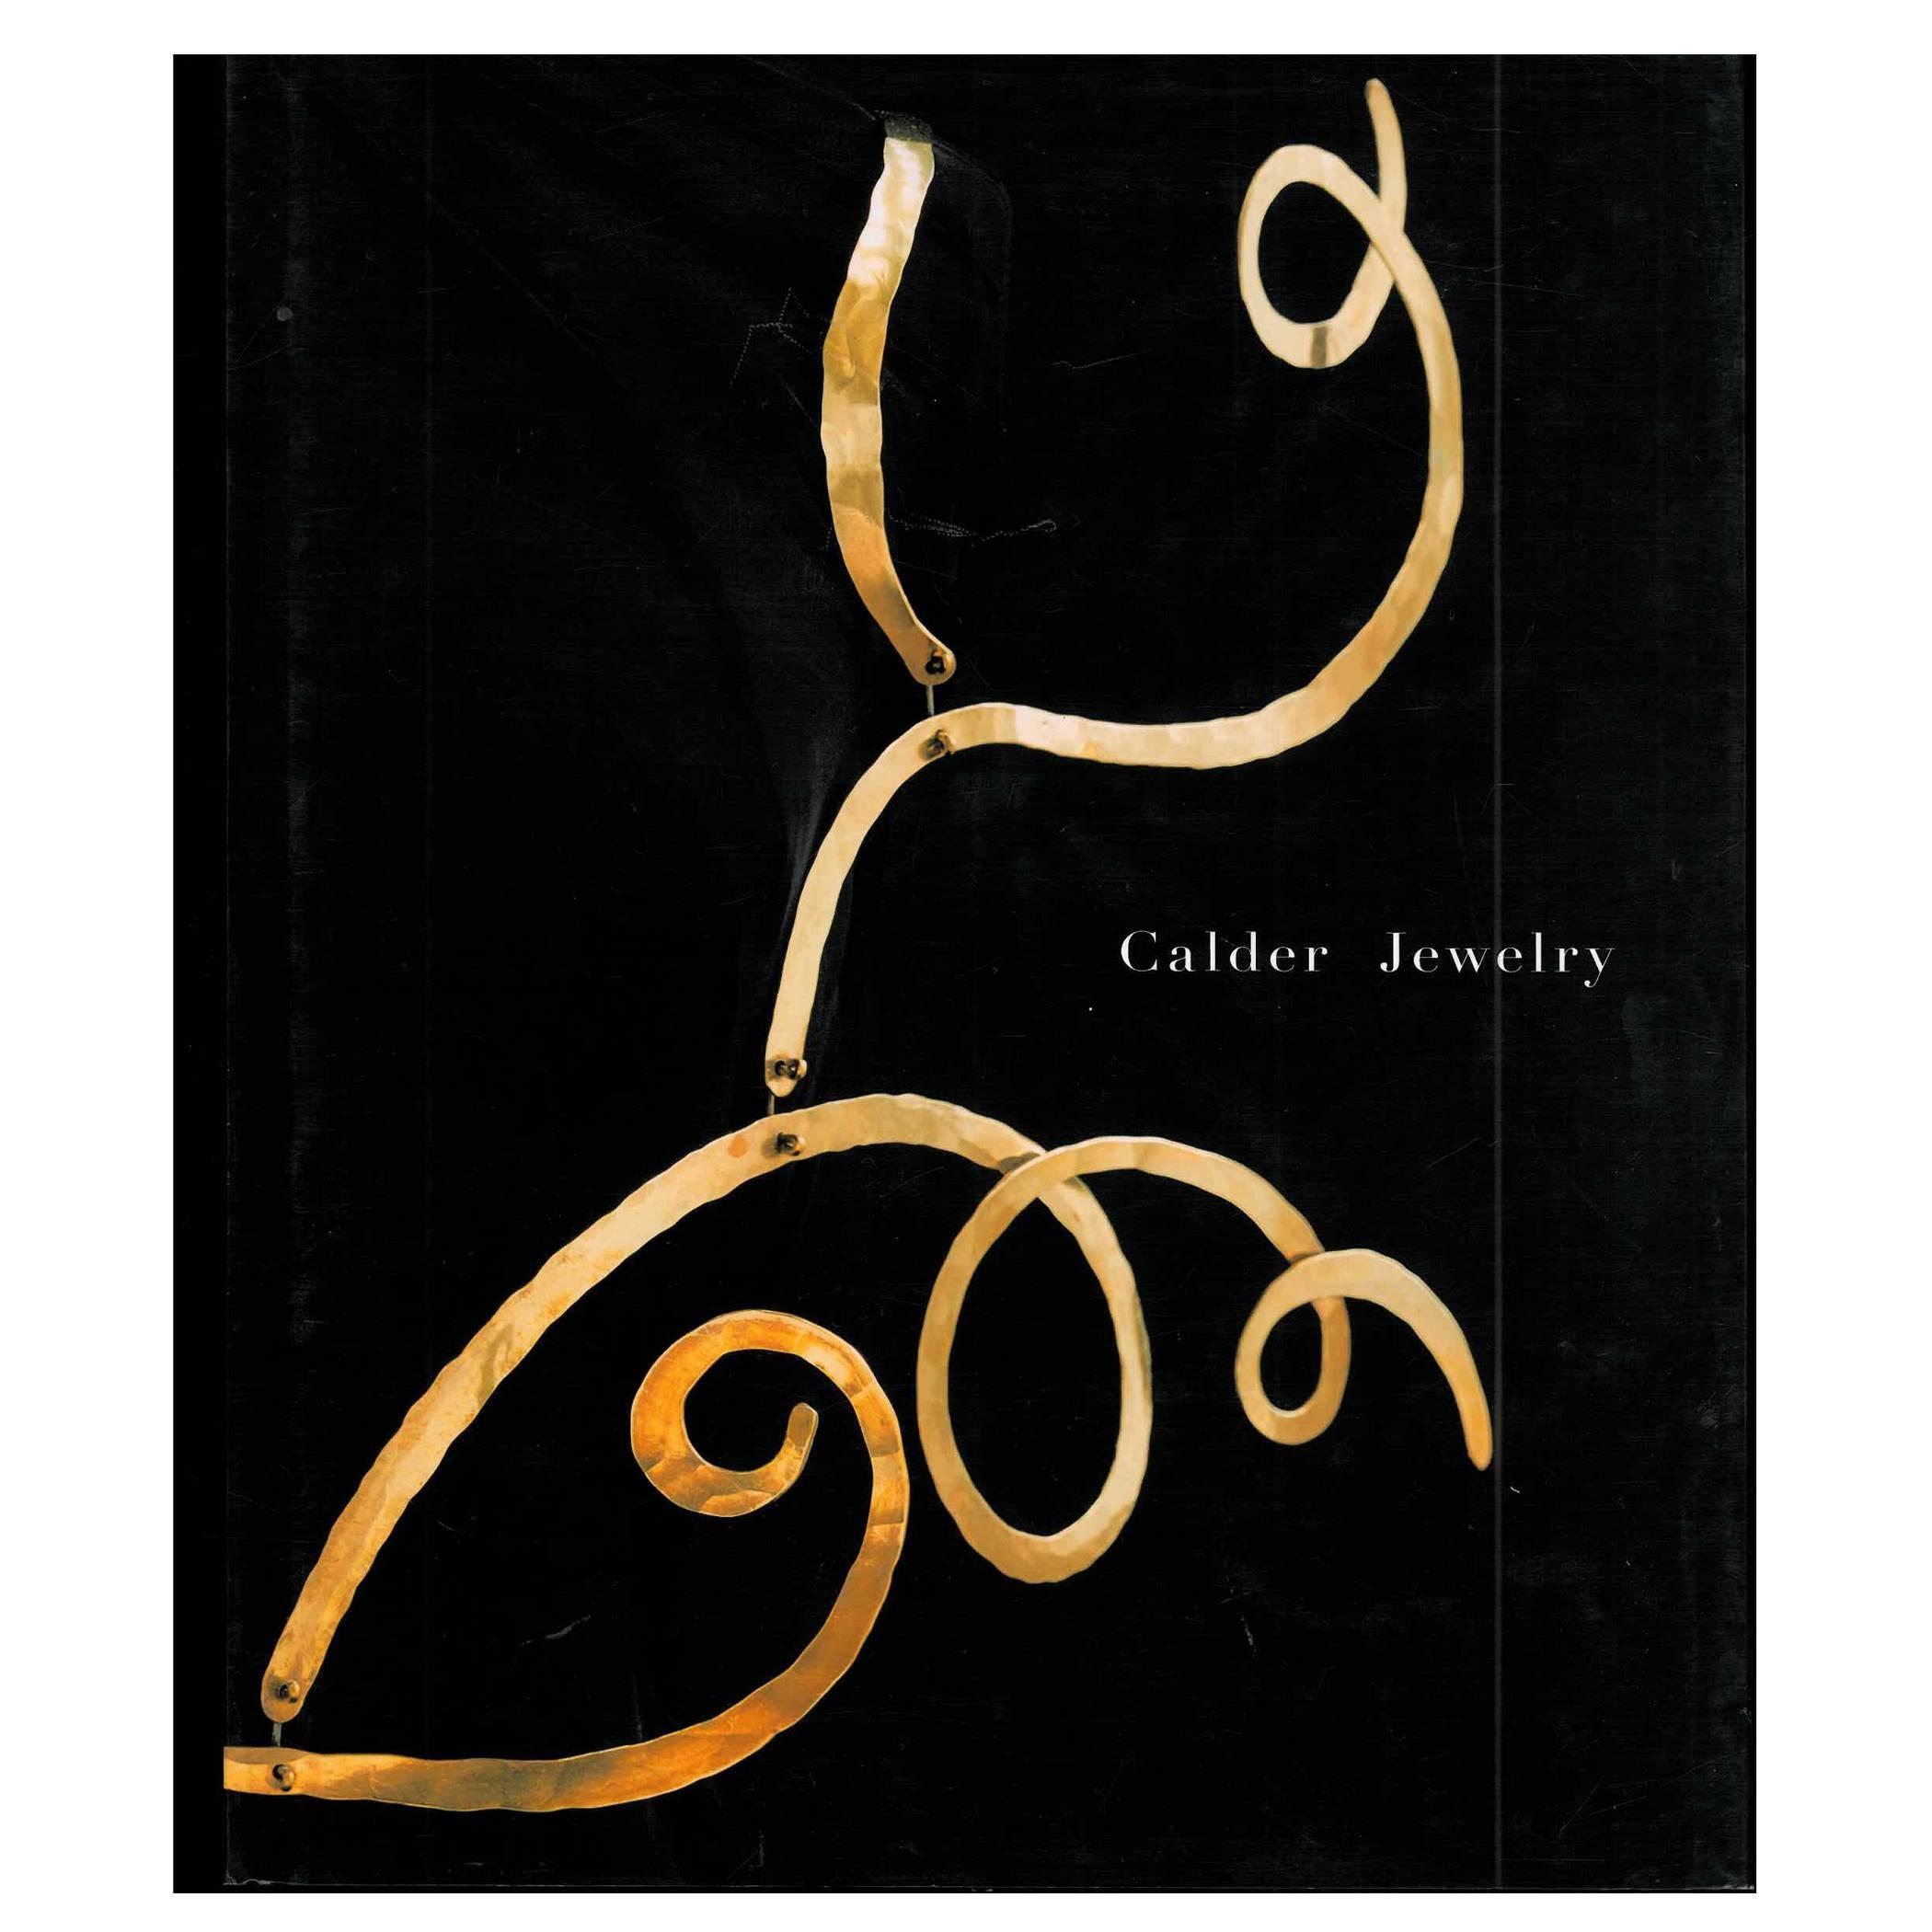 Book of Calder Jewelry